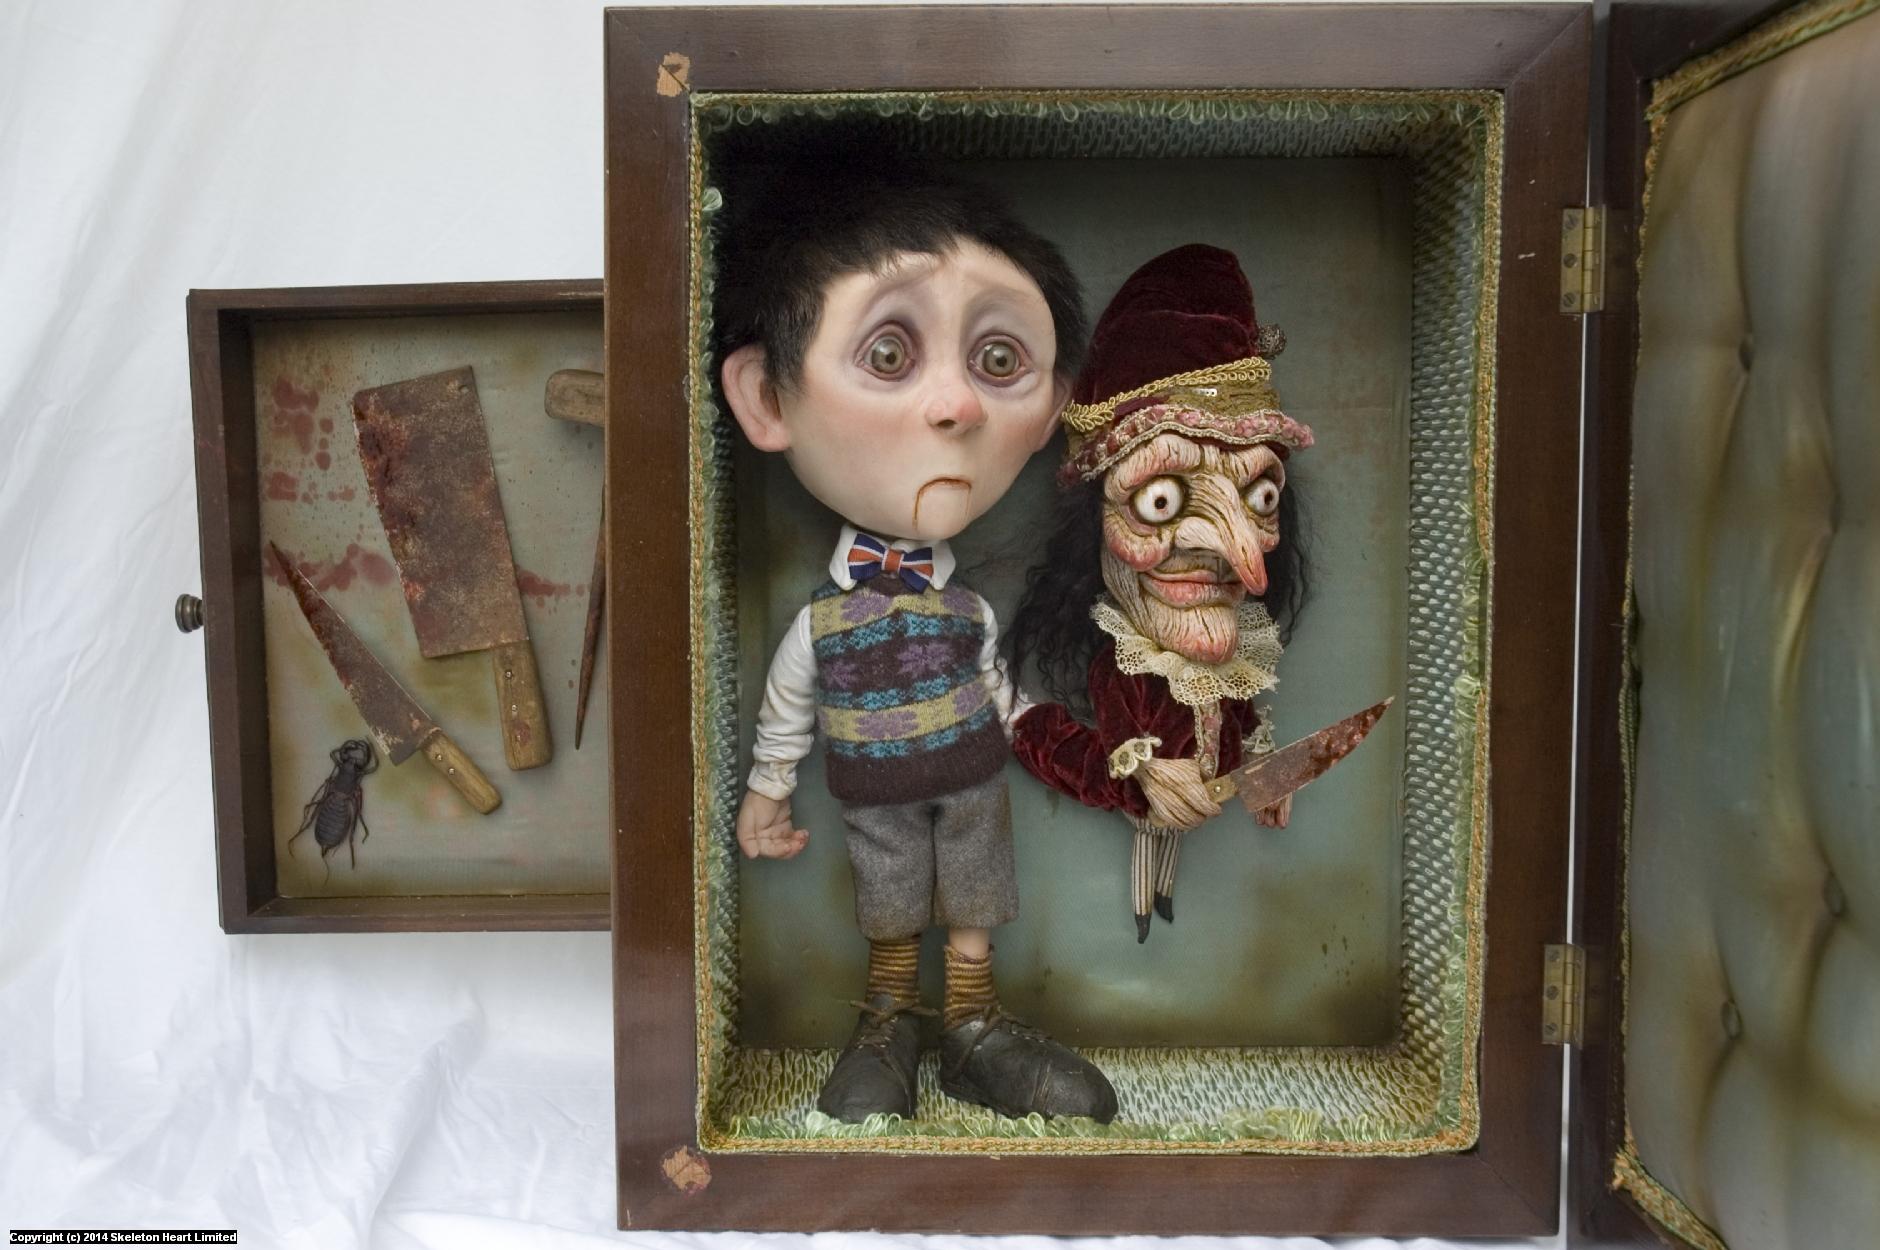 Albert Grimsbottom and his Murderous Puppet Artwork by Skeleton Heart